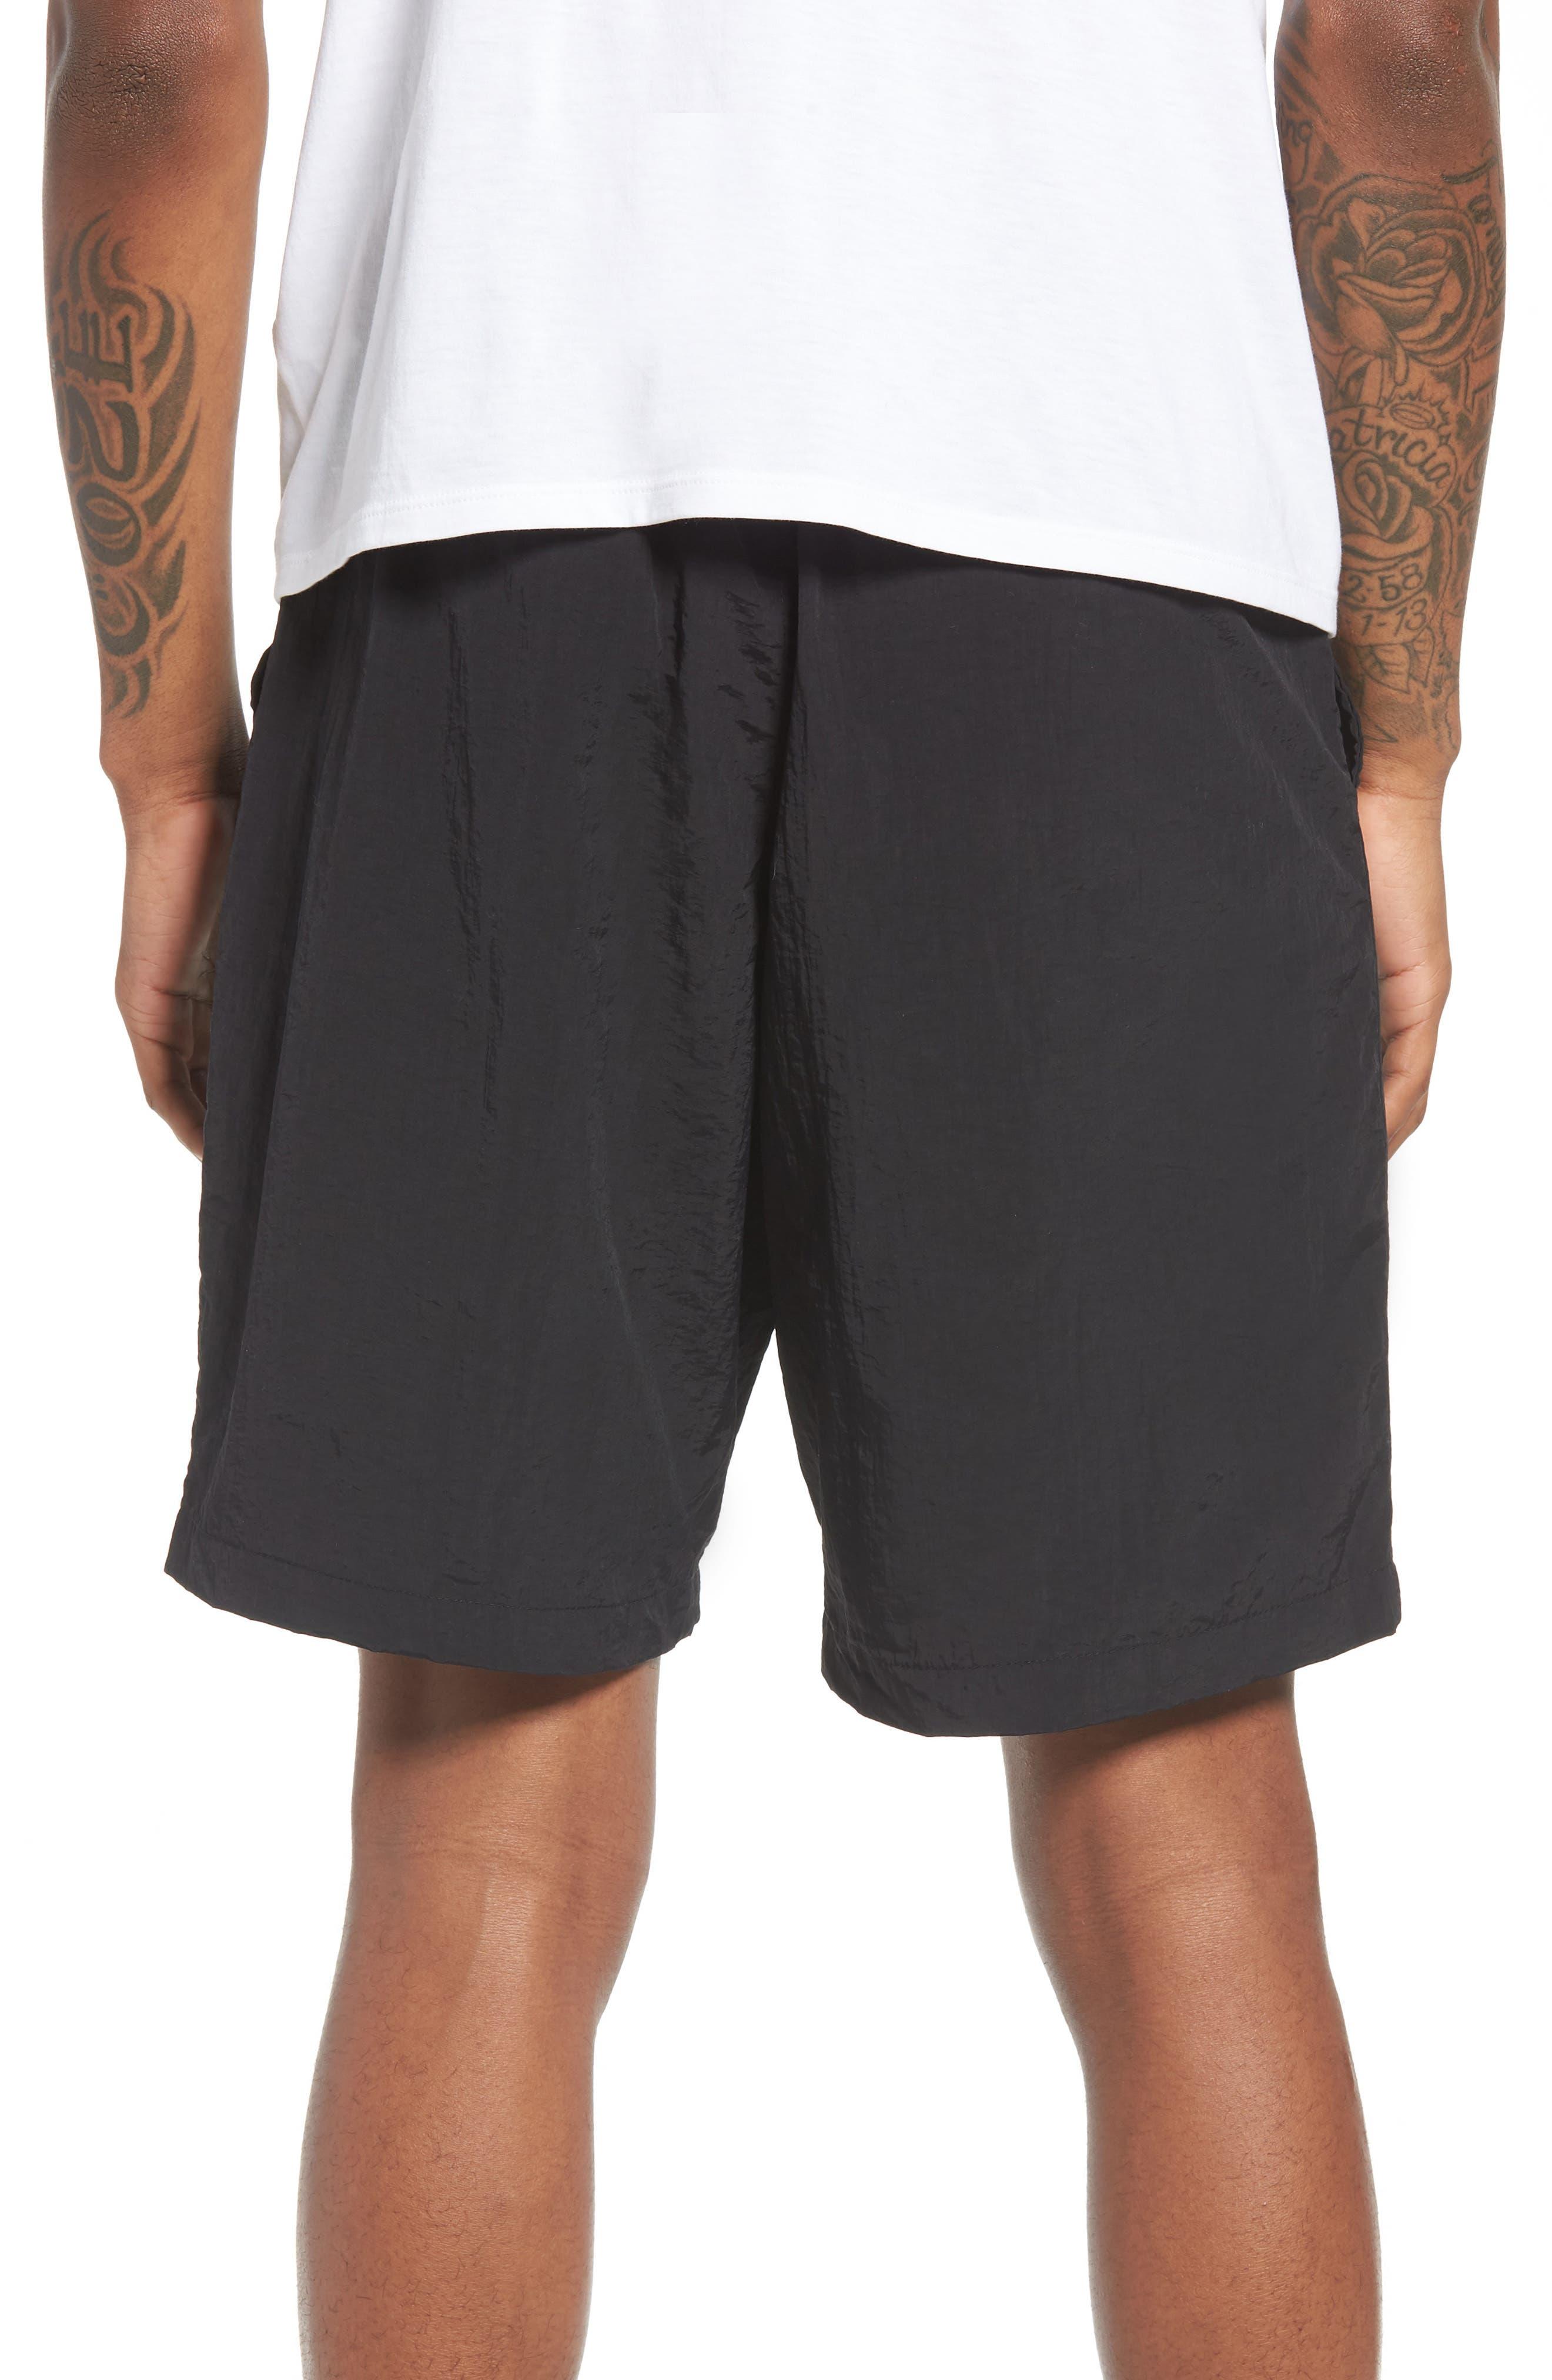 Mondy Shorts,                             Alternate thumbnail 2, color,                             001